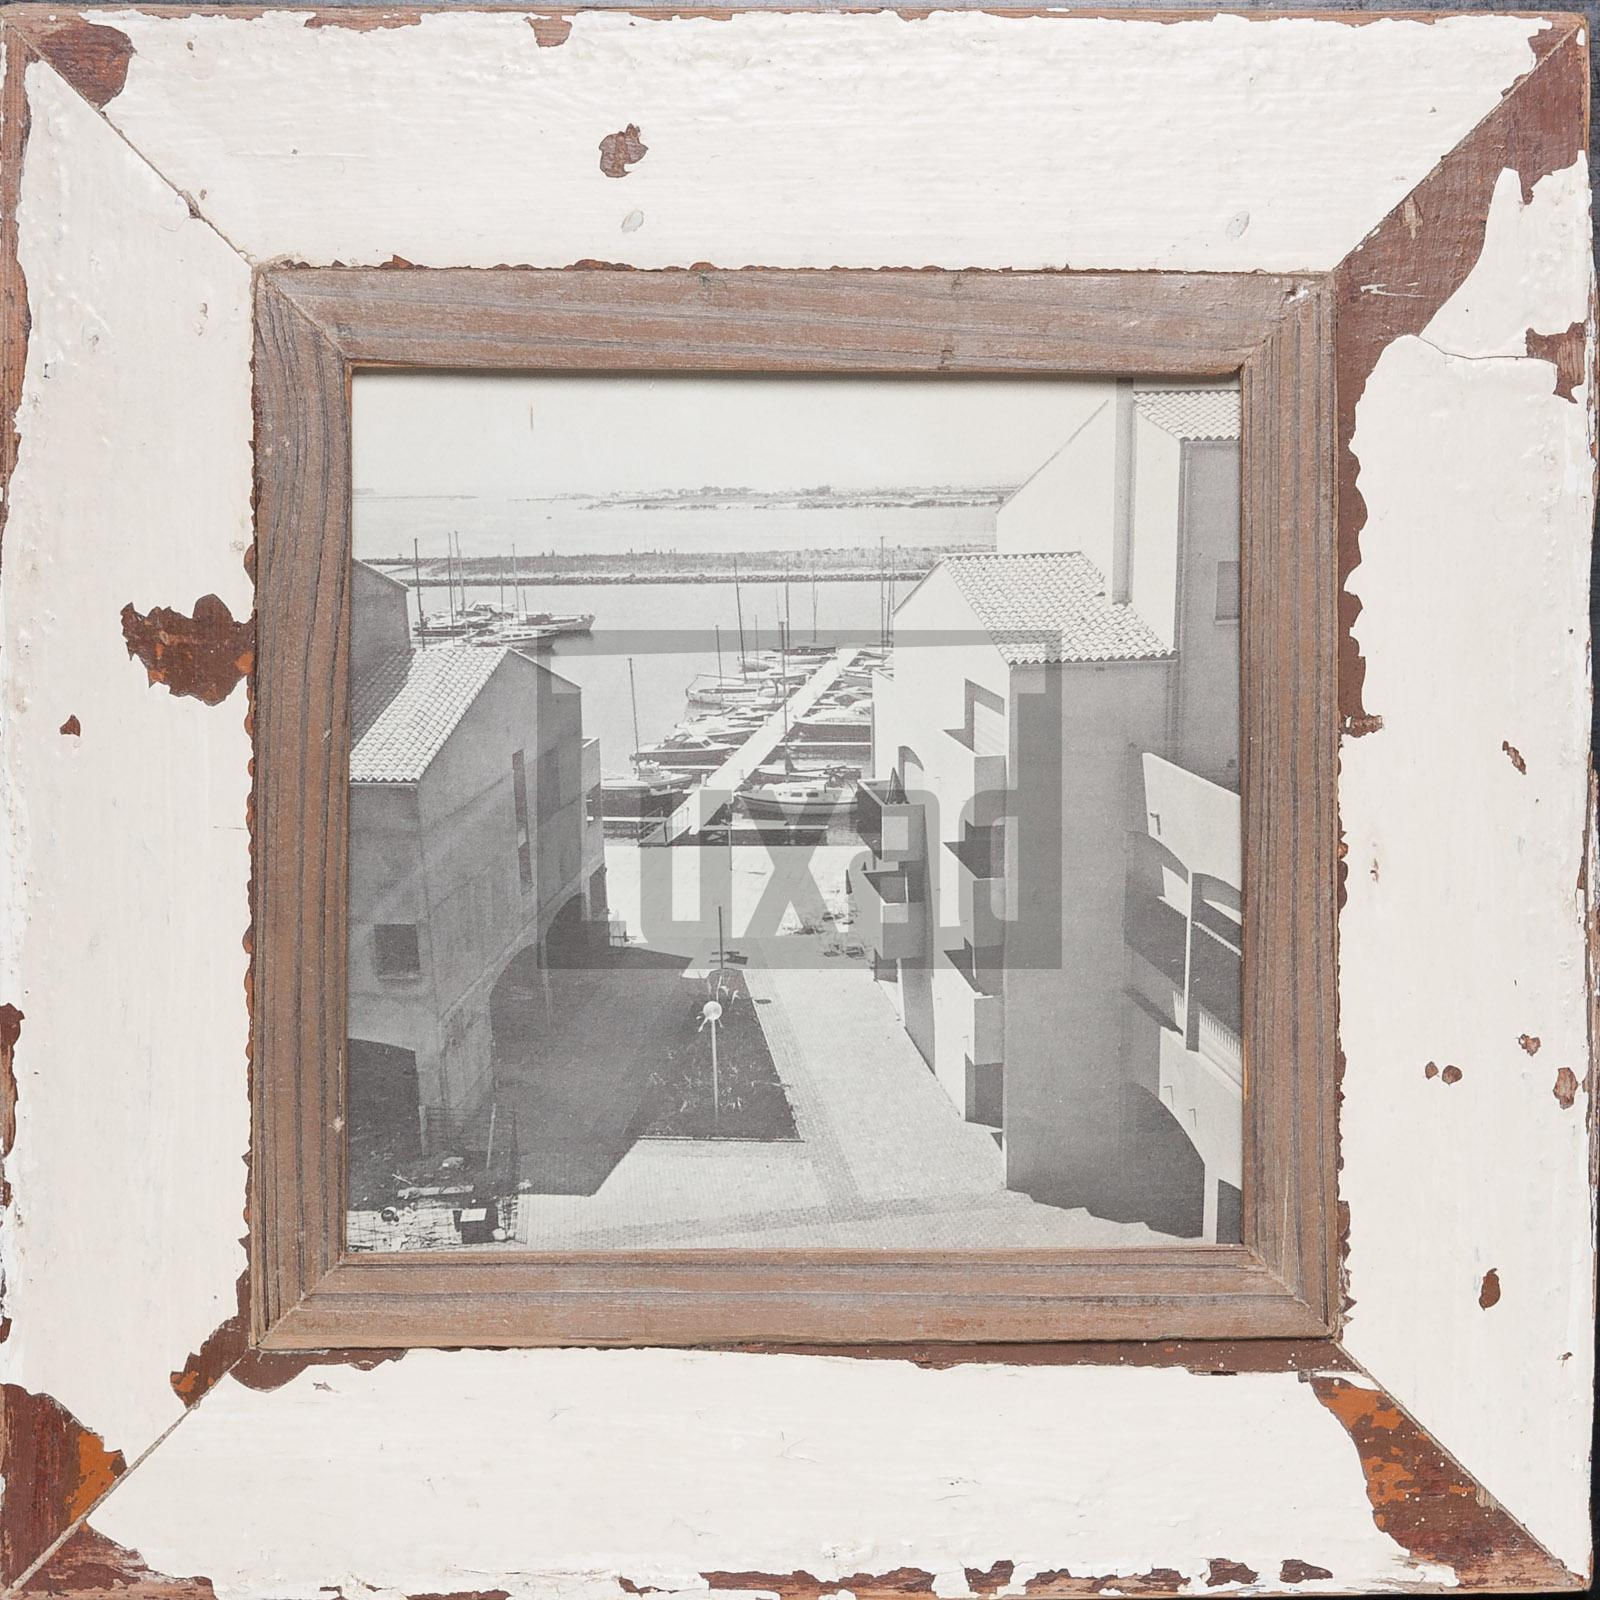 Quadratischer Altholz-Fotorahmen für quadratische Fotos